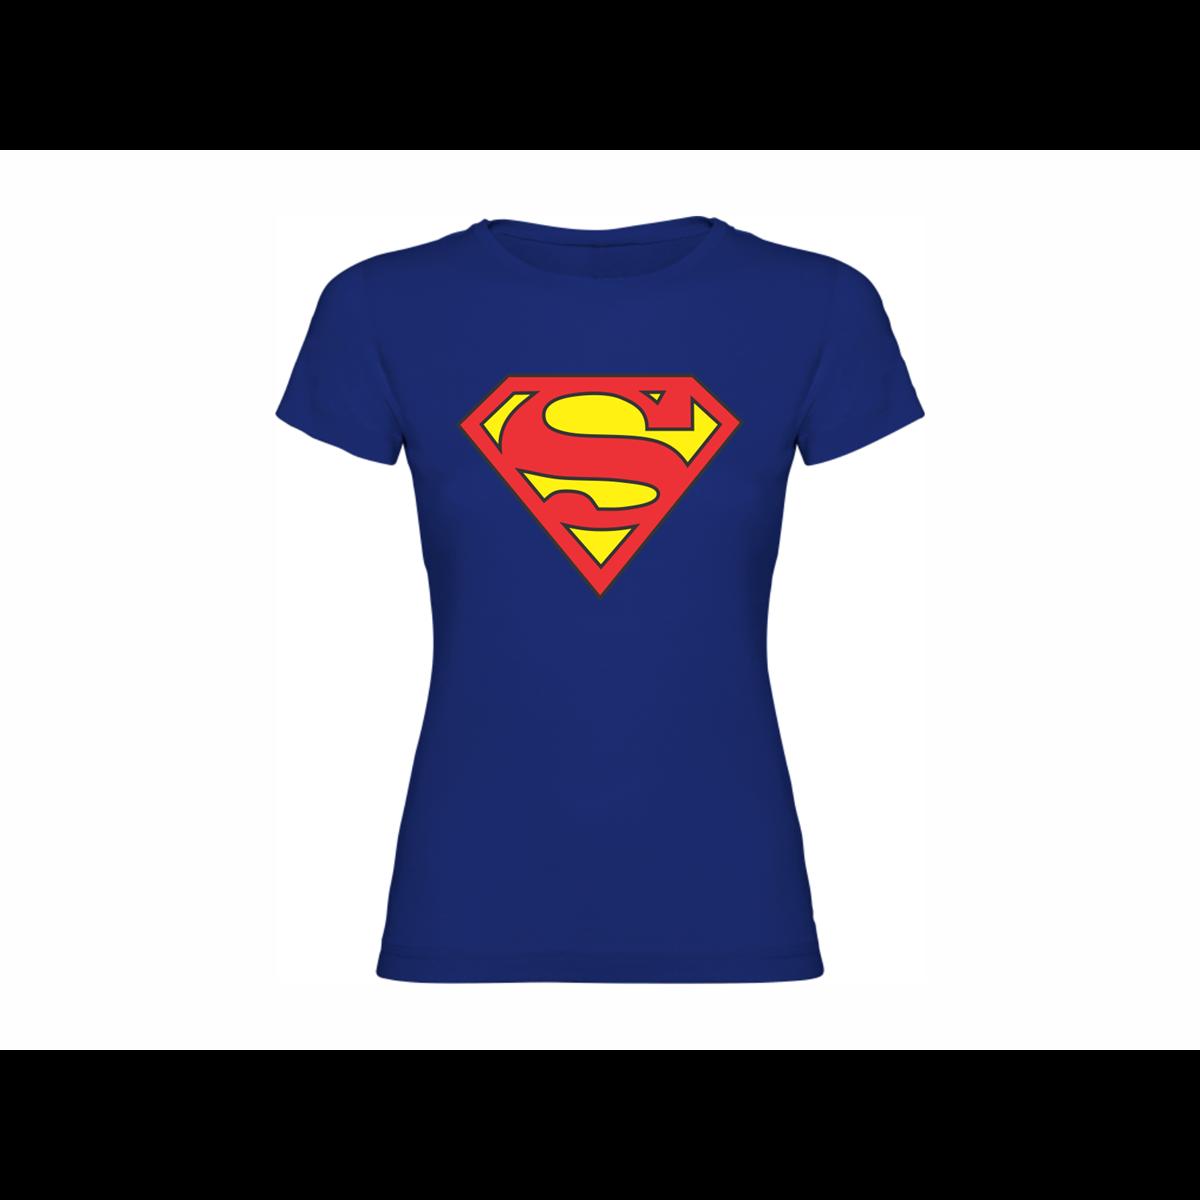 woman t shirt hq superman. Black Bedroom Furniture Sets. Home Design Ideas